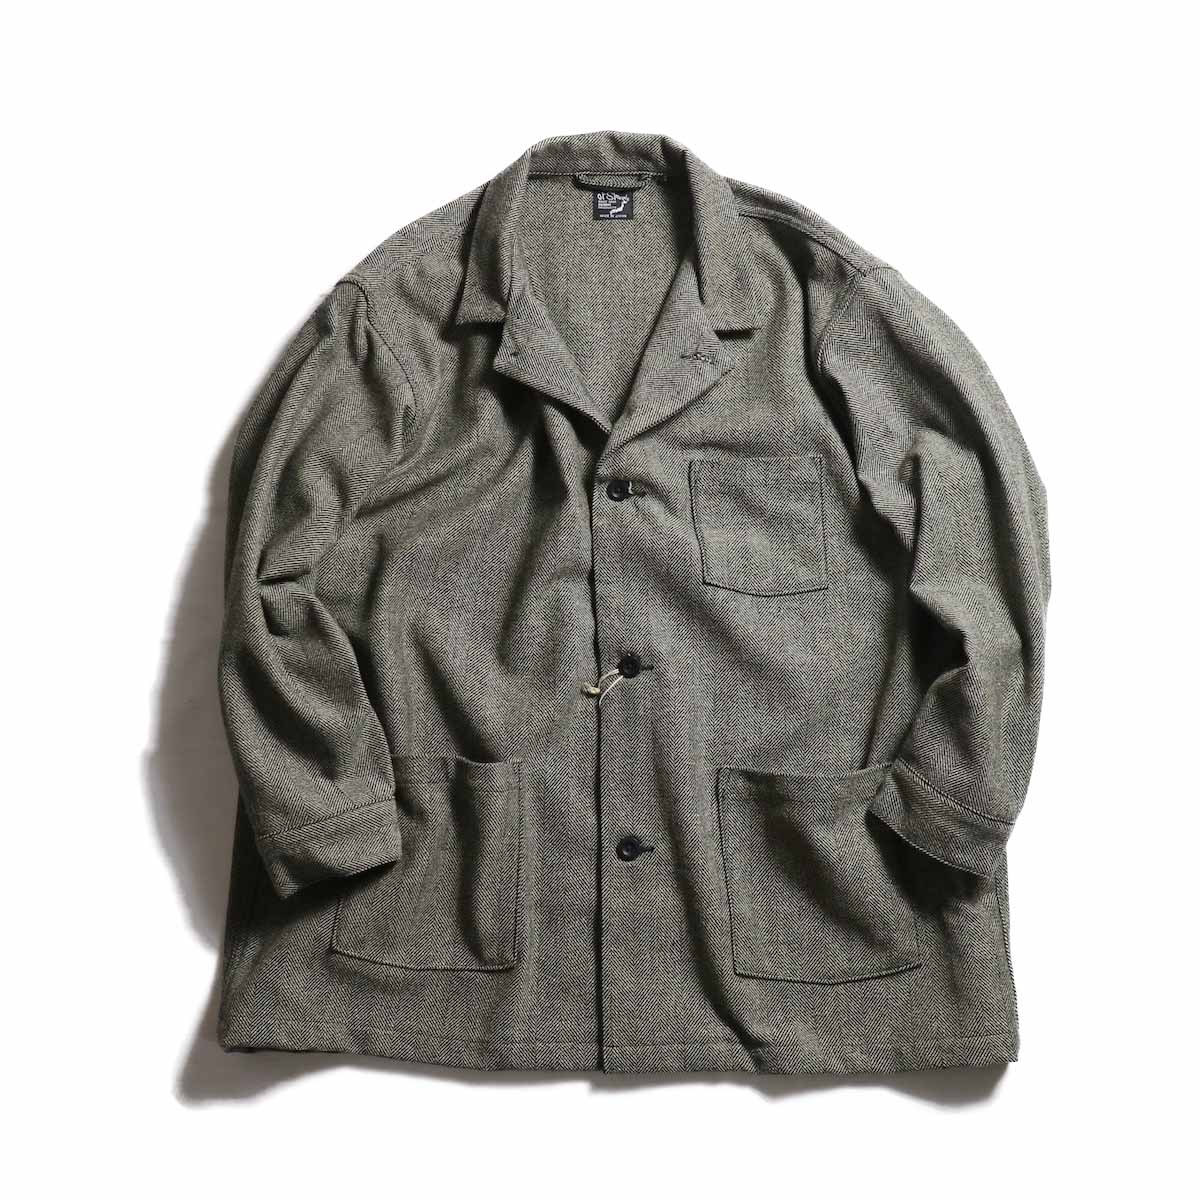 orSlow / Pajama Shirt -Melton Wool Herringbone Twill(GRAY)